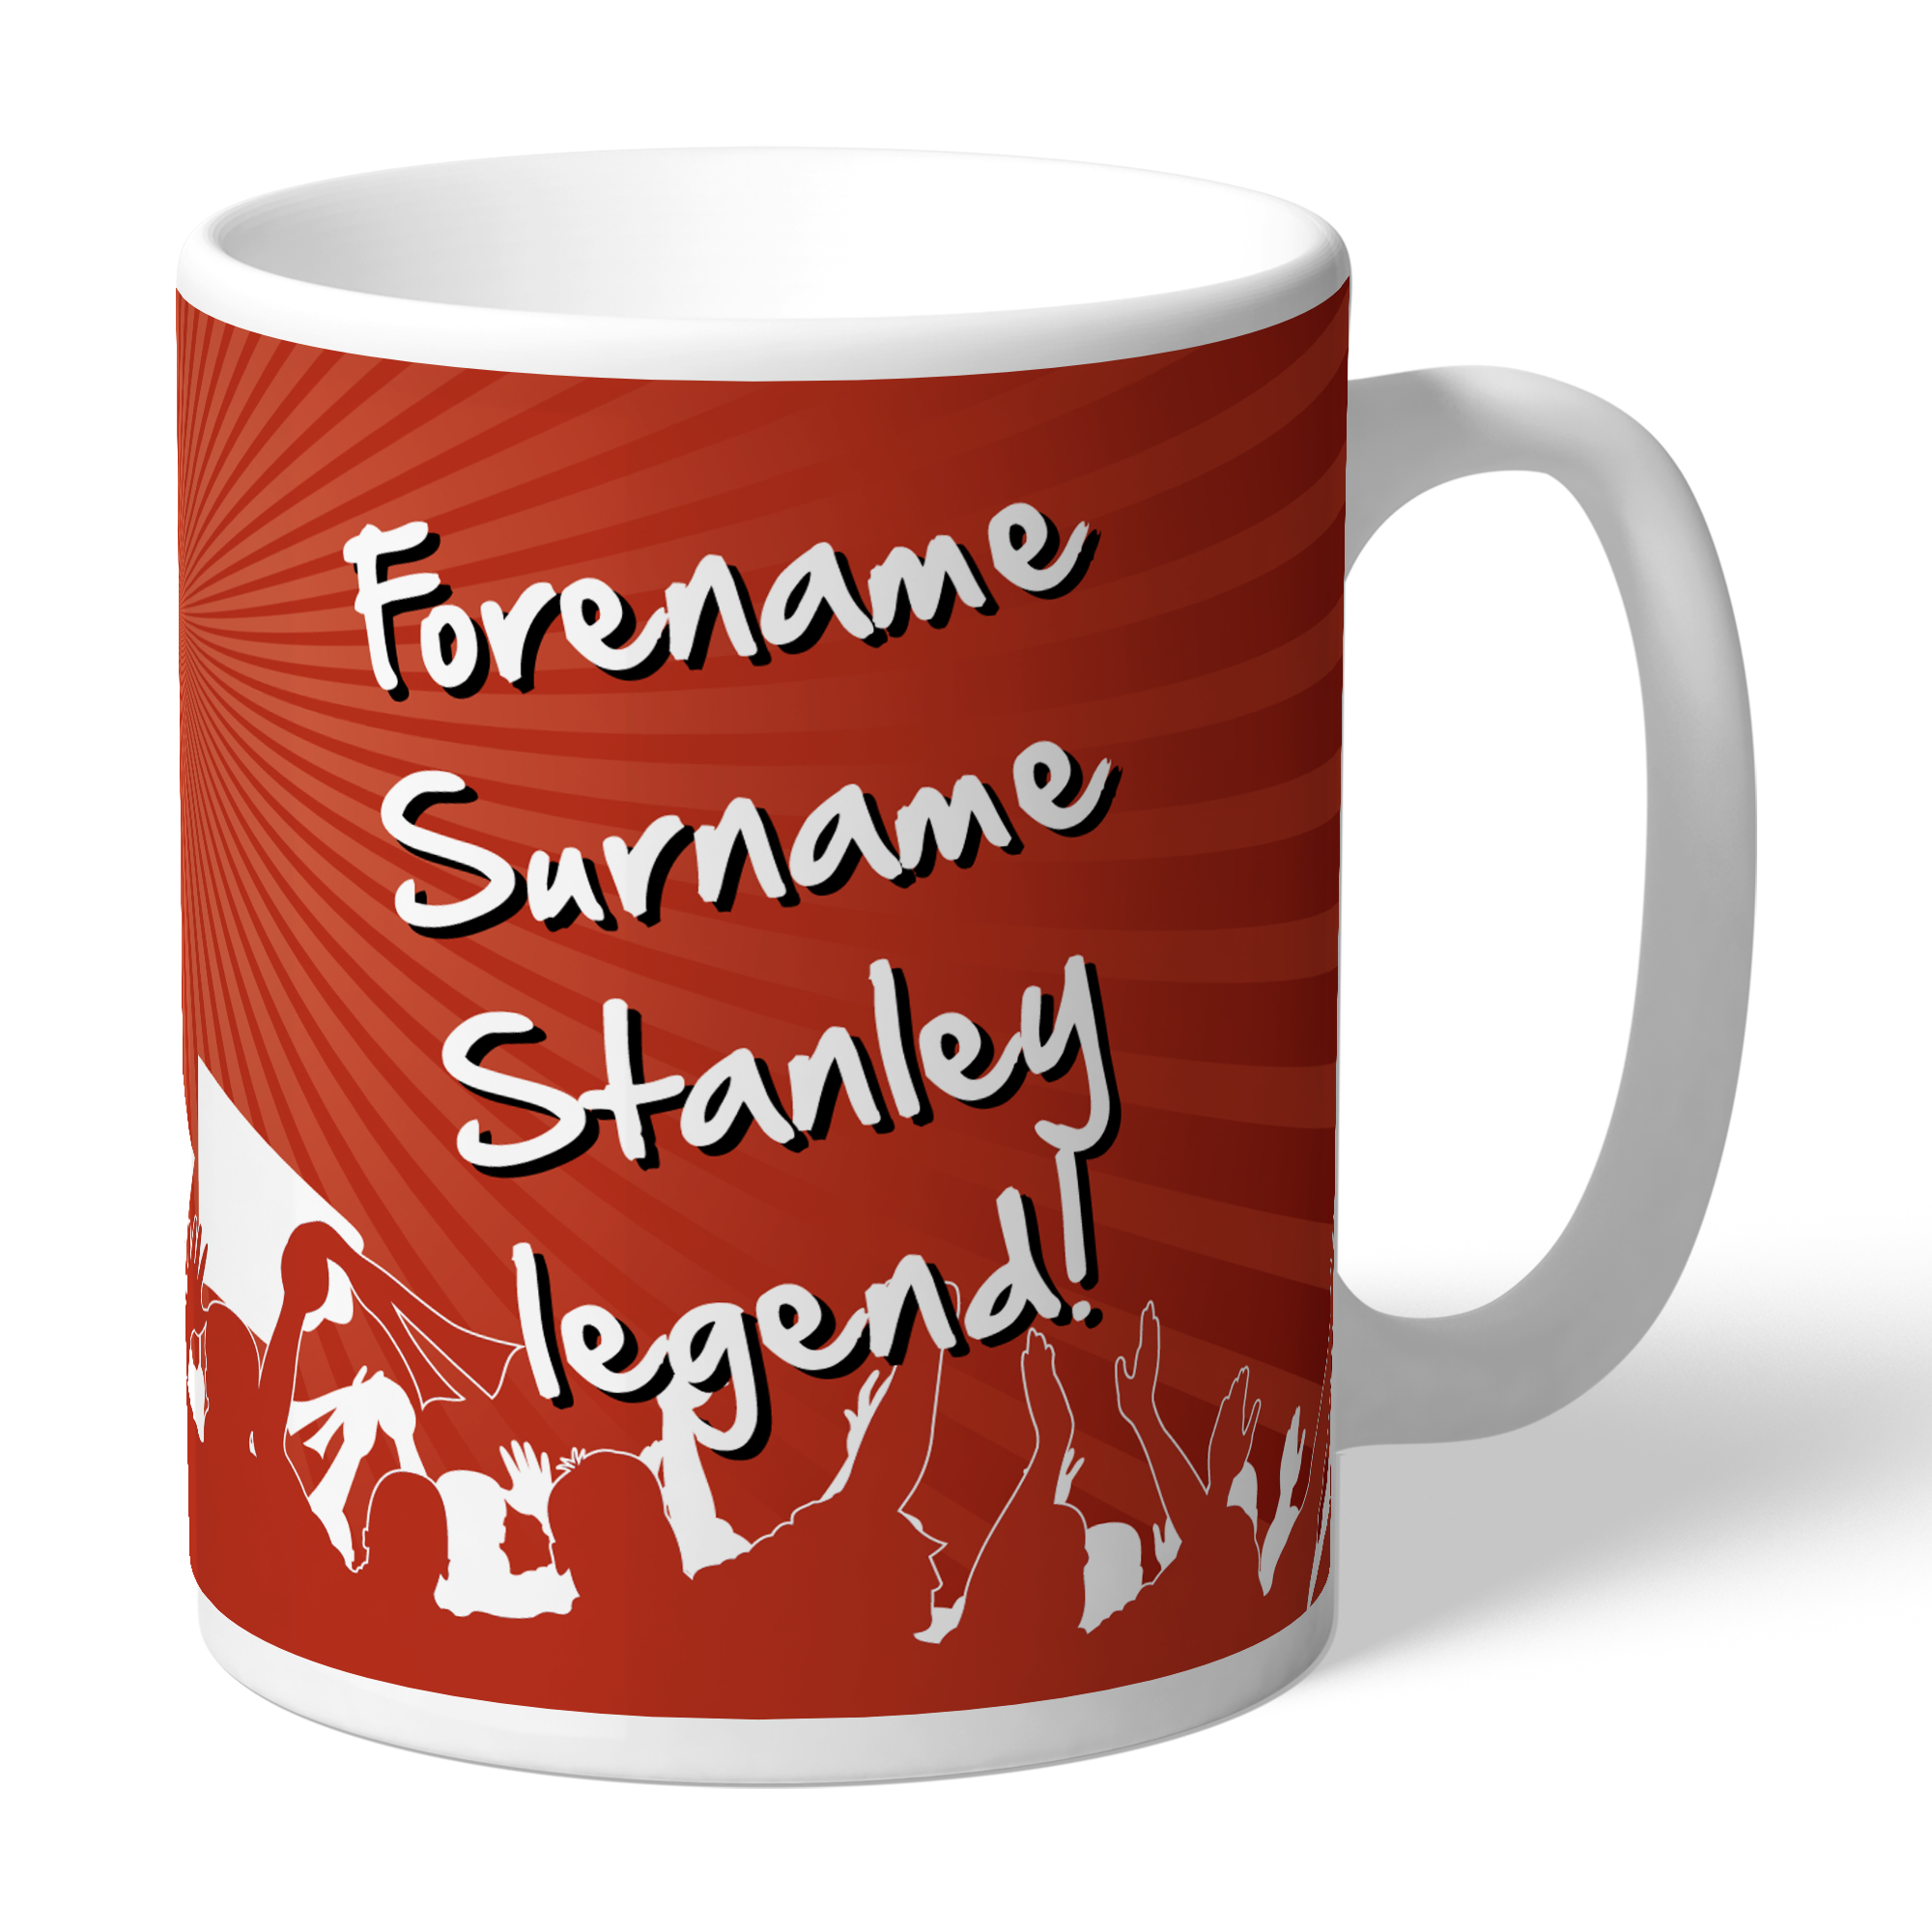 Accrington Stanley Legend Mug